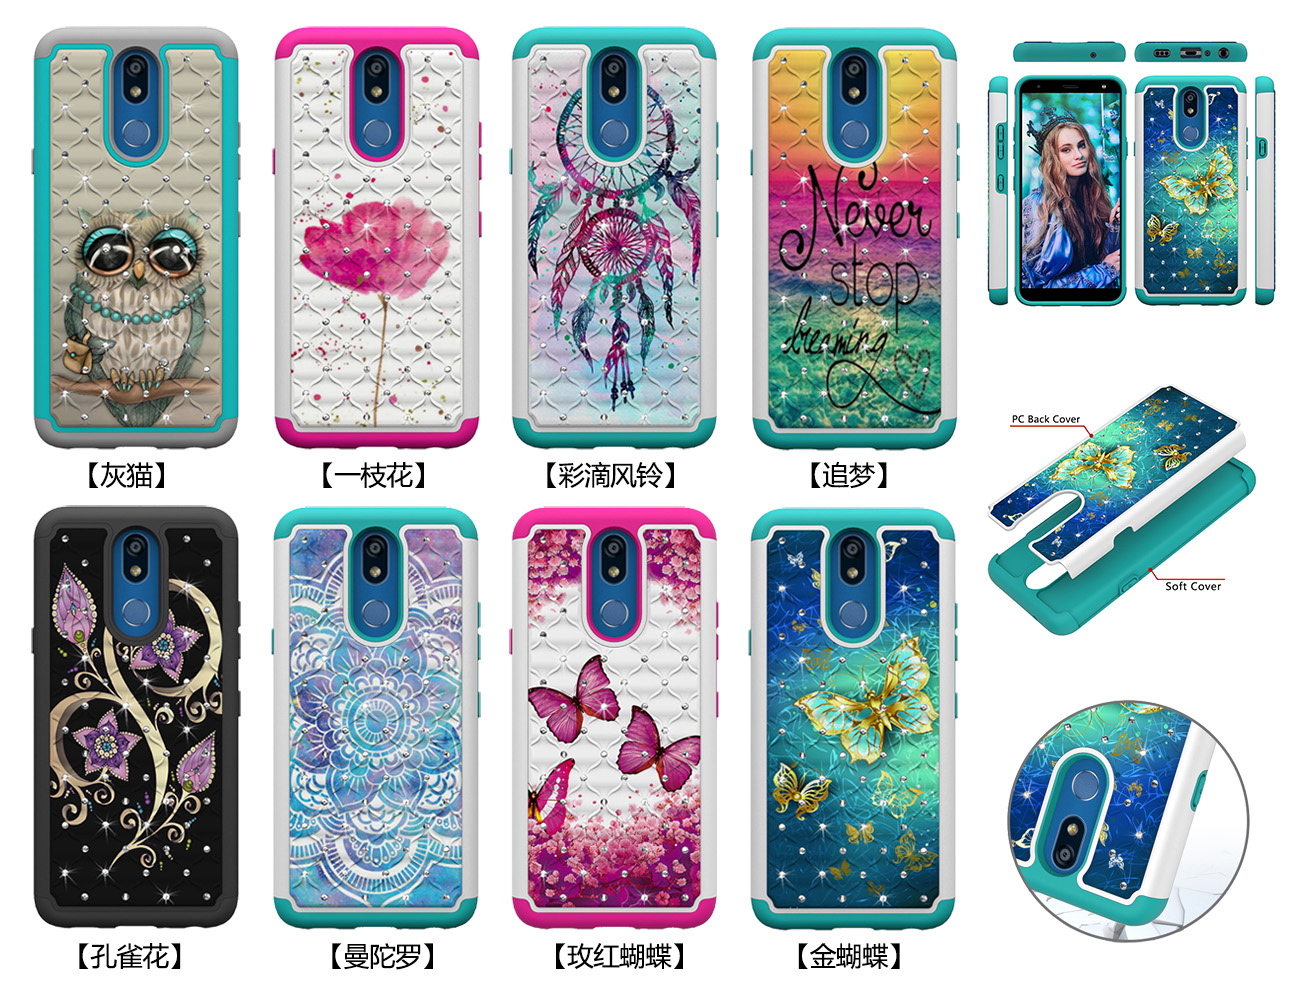 Brilho de Diamante Casos de Telefone Para LG K40 K12 Plus PC  Silicone Híbrido Case for Google Pixel 3a 3a XL Moda tampa traseira  AcessóriosEstojos encaixados